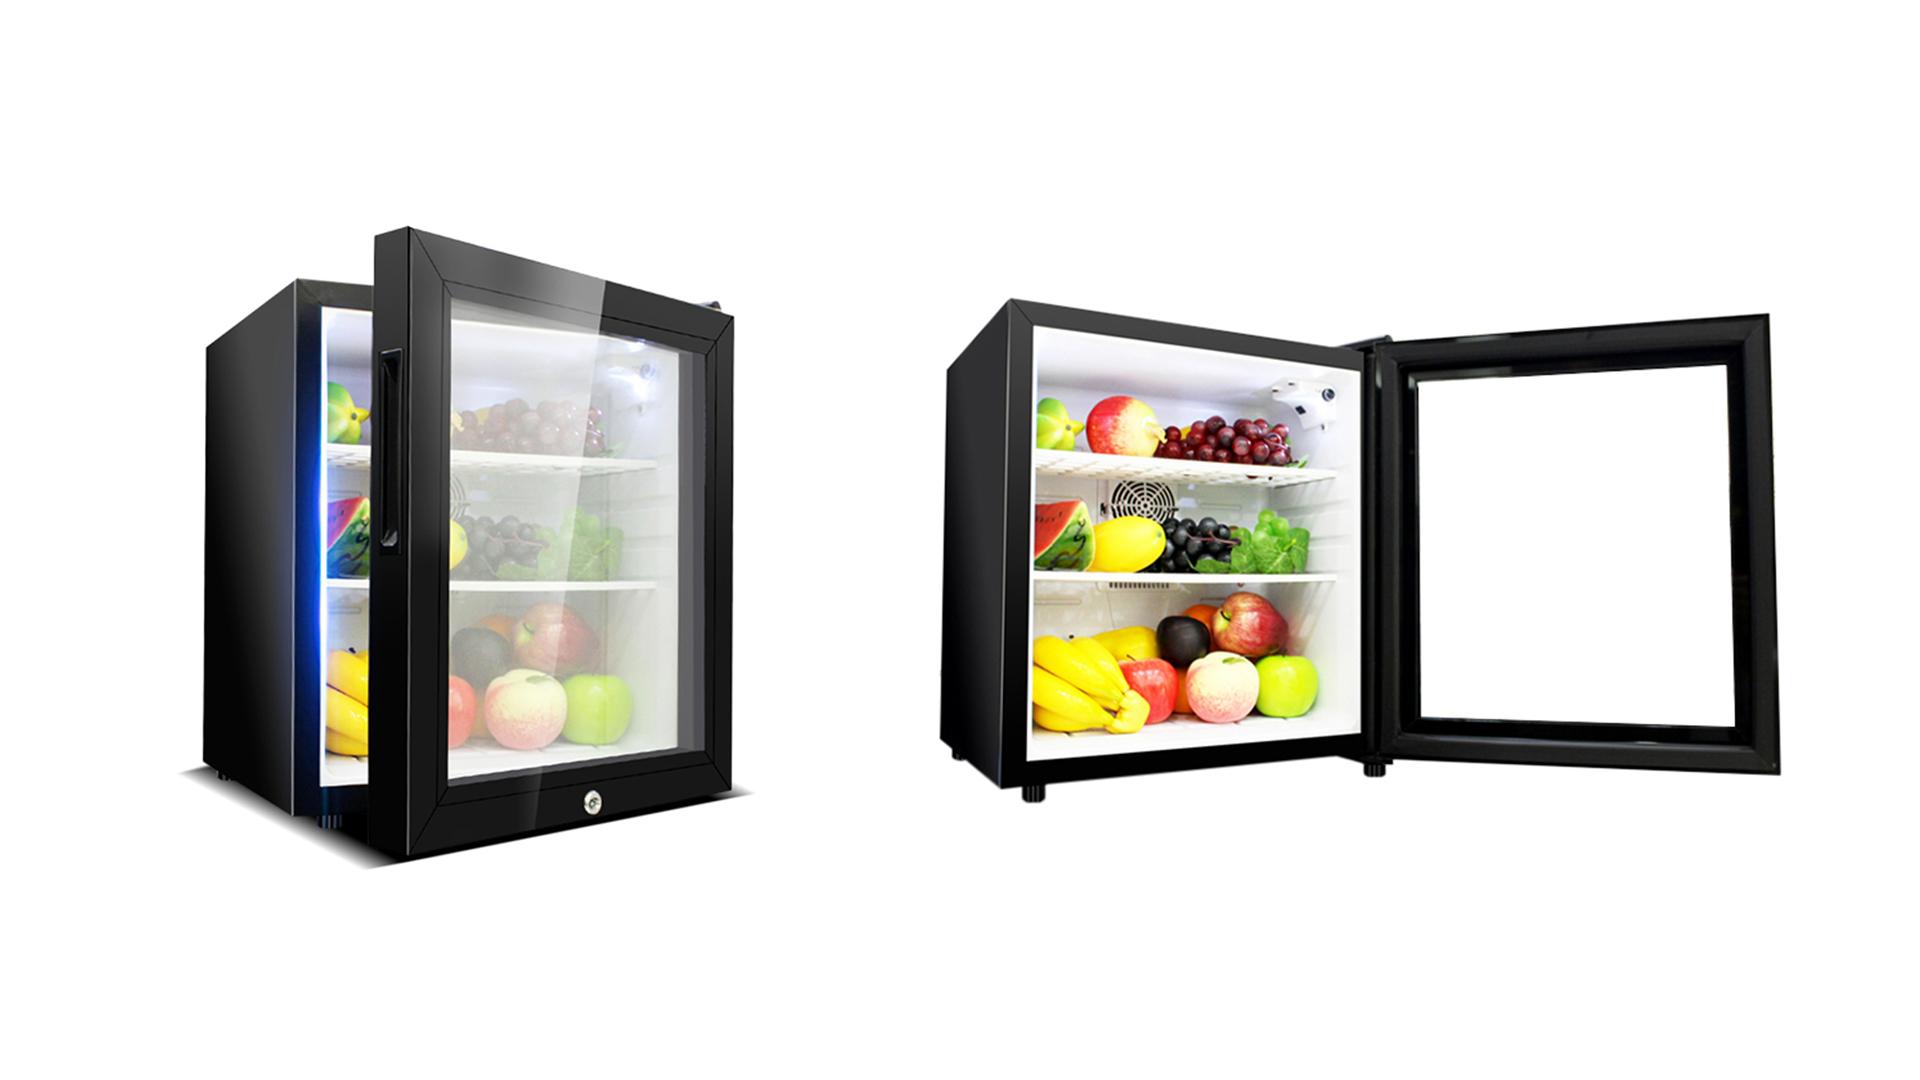 30L /42L Hot Sale Household Small Refrigerator, Hotel Mini Bar Fridge